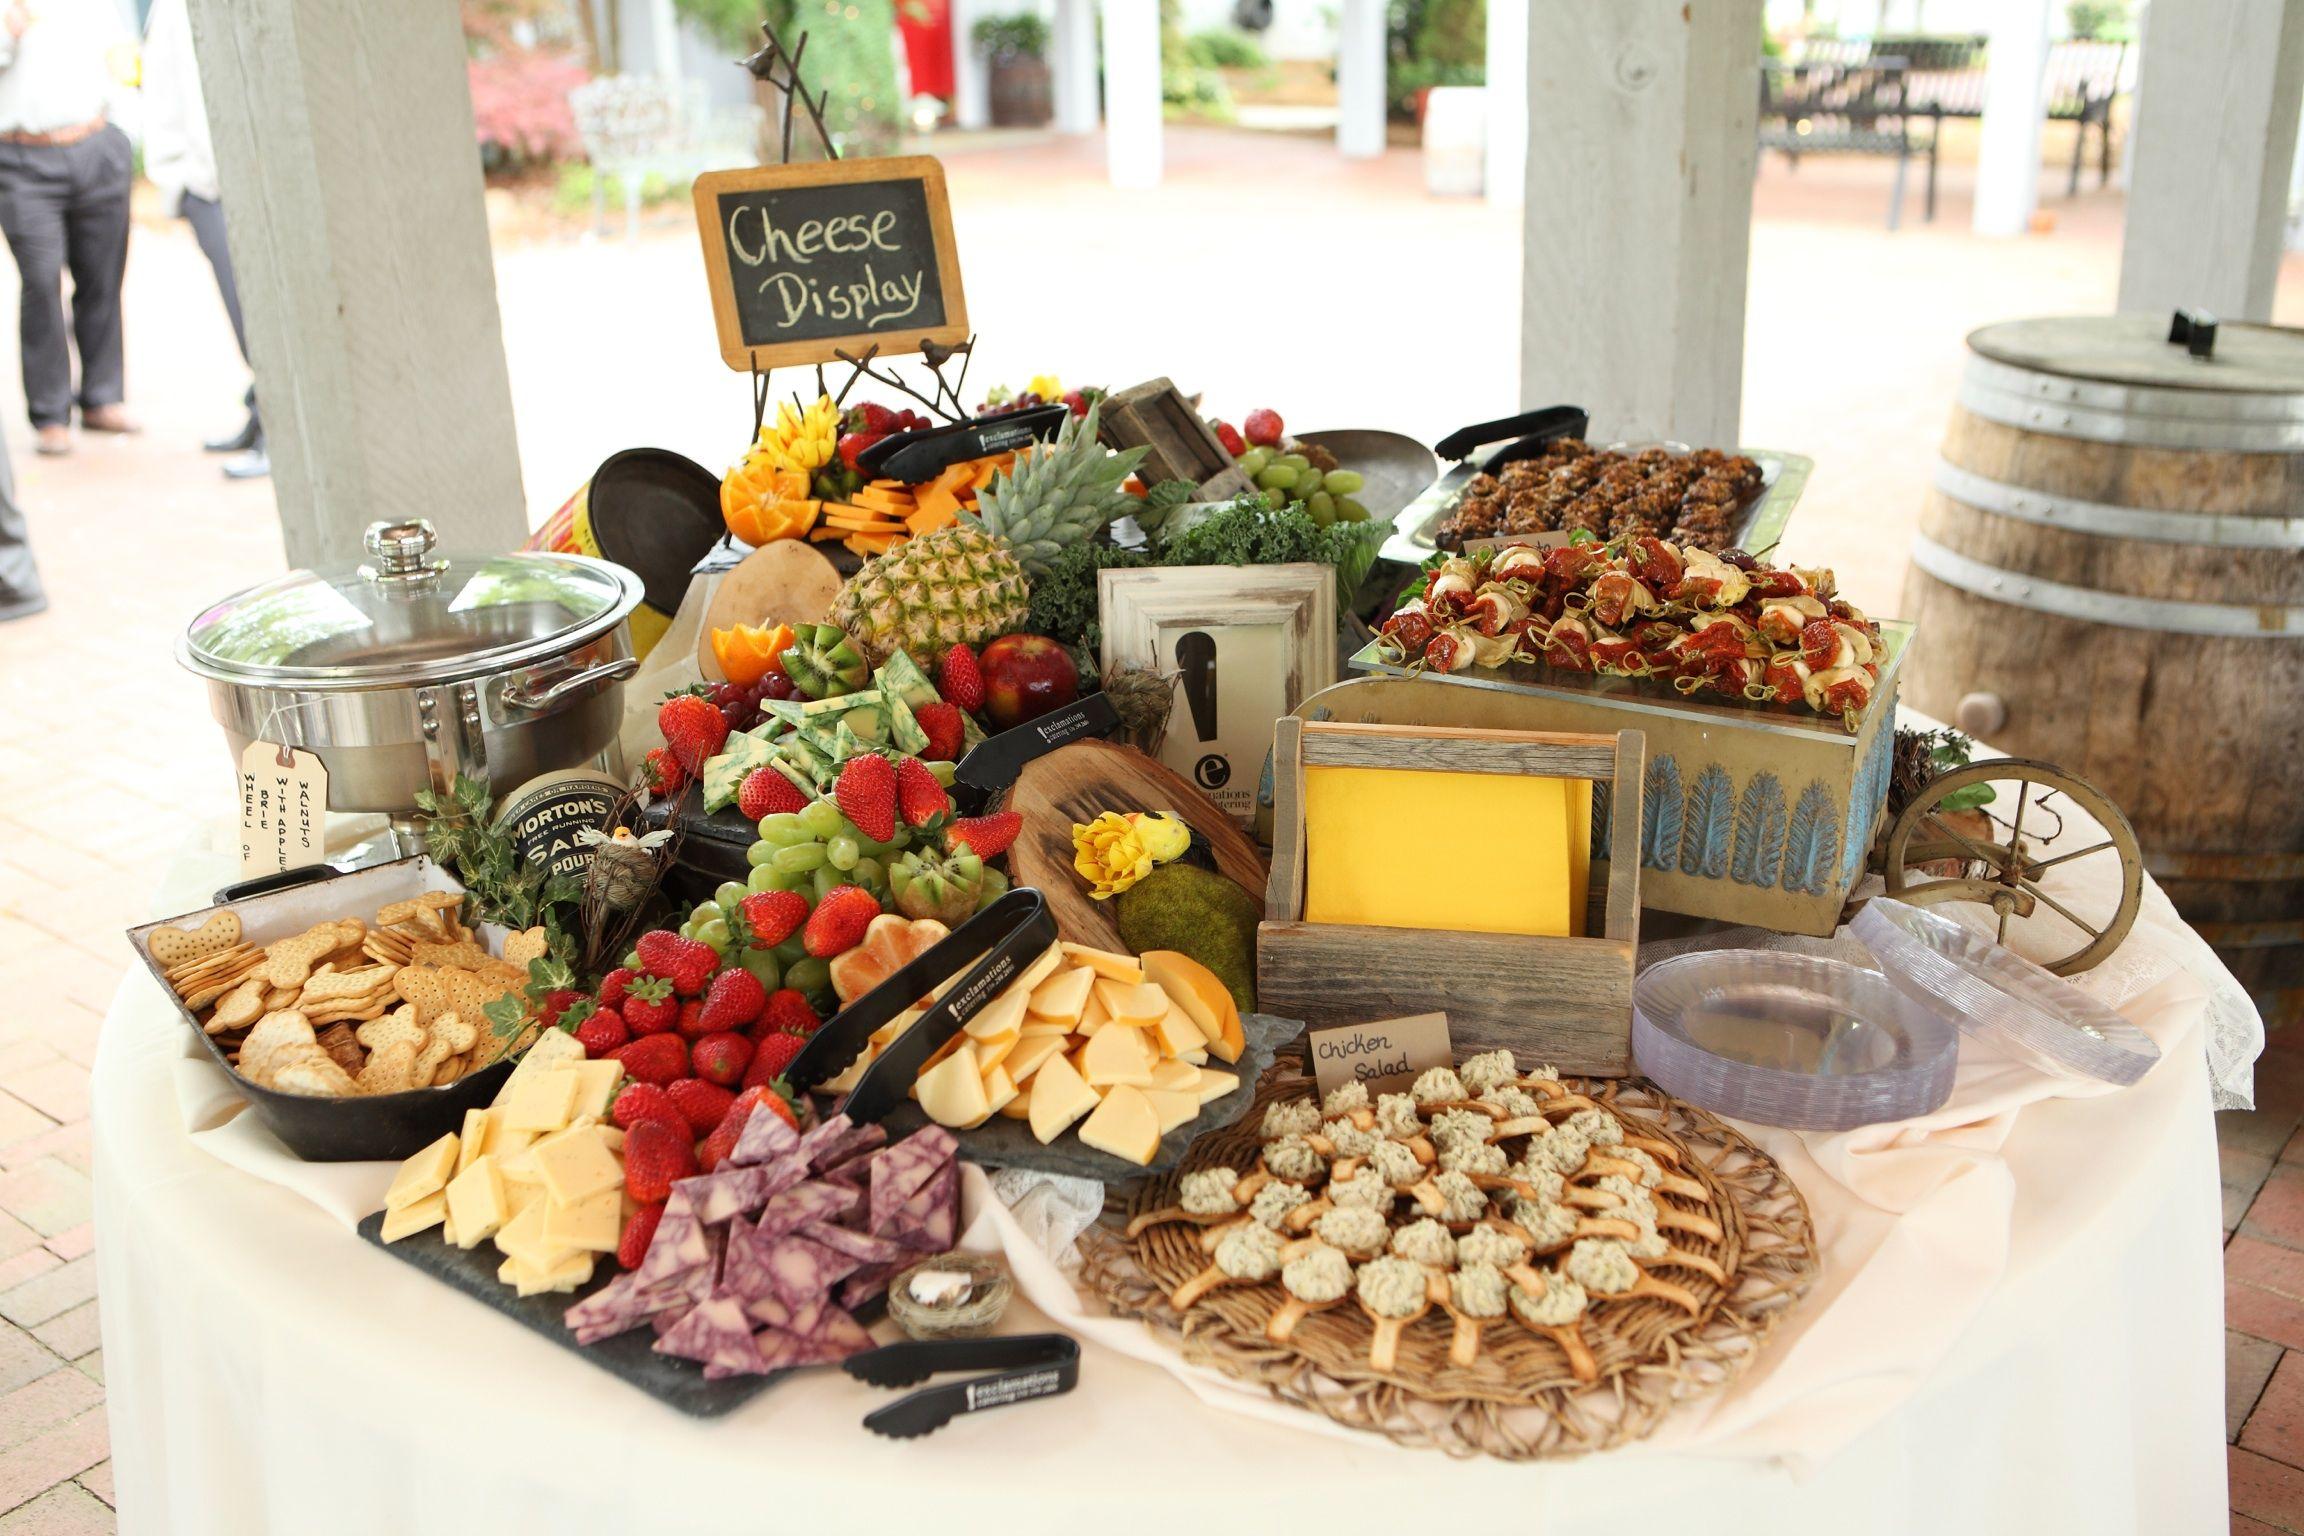 wedding reception dinner ideas on budget%0A Emejing Wedding Reception Food On A Budget Images Styles Ideas